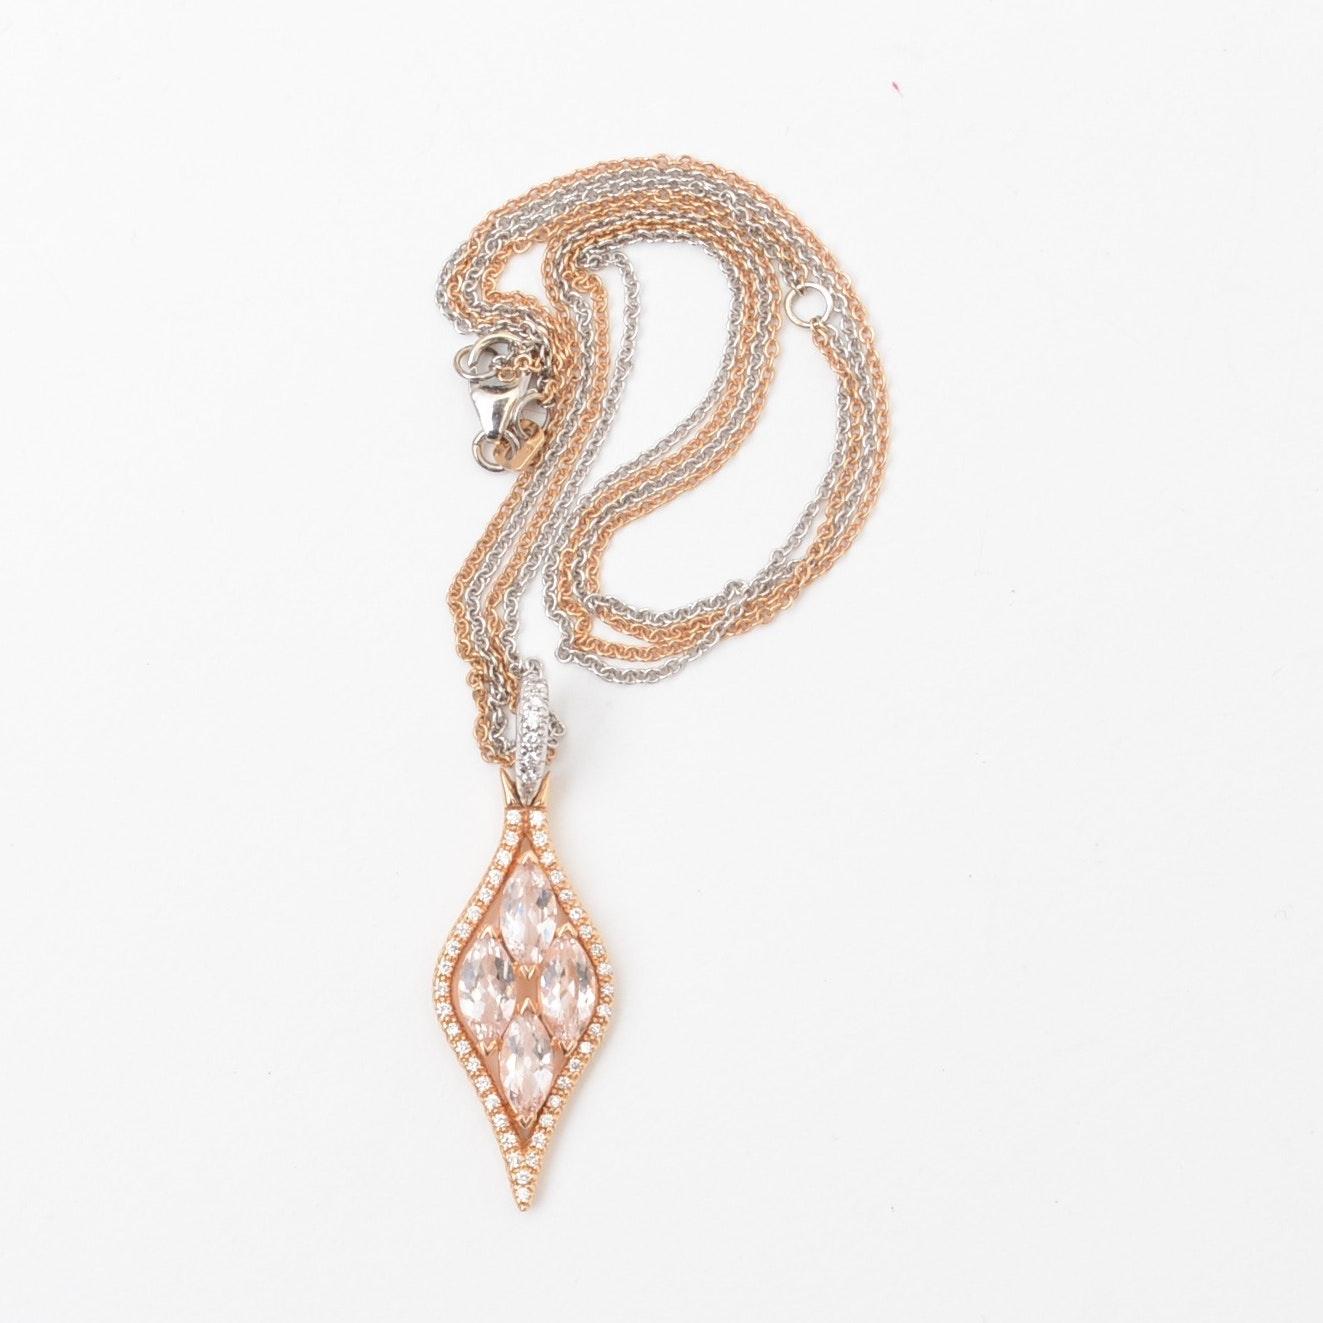 18K Morganite and Diamond Necklace